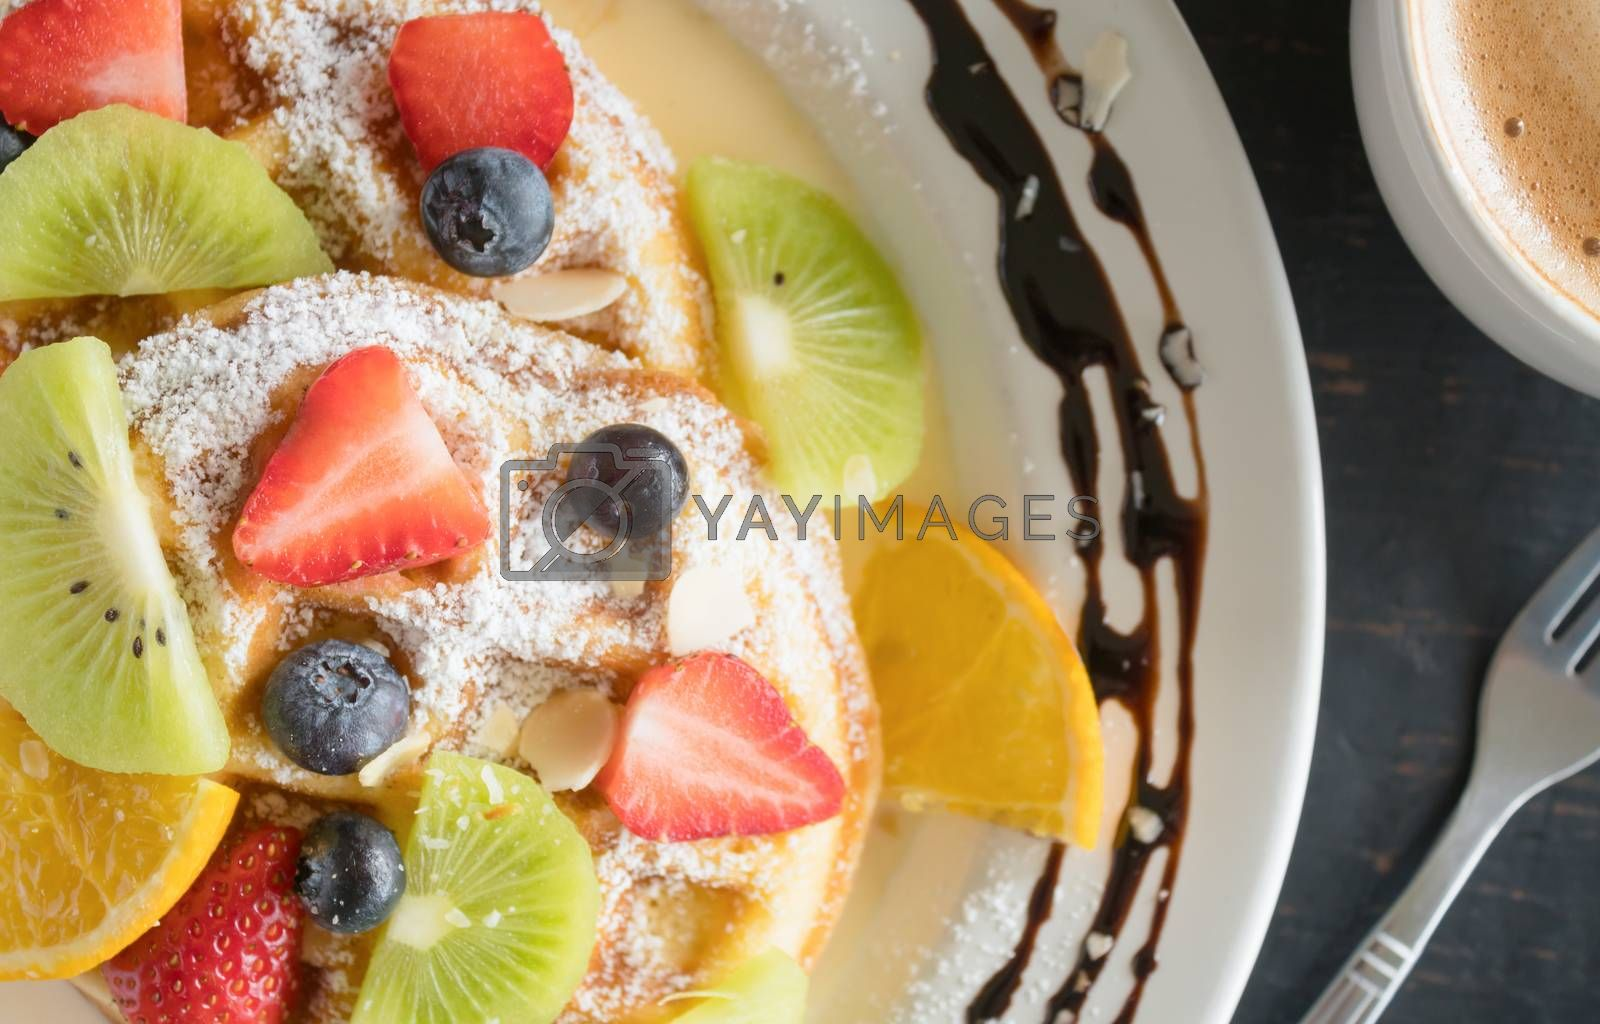 Flatlay Half Strawberry Blueberry Kiwi Lemon Waffle Chocolate Coffee Dessert. Fruity dessert food and drink category